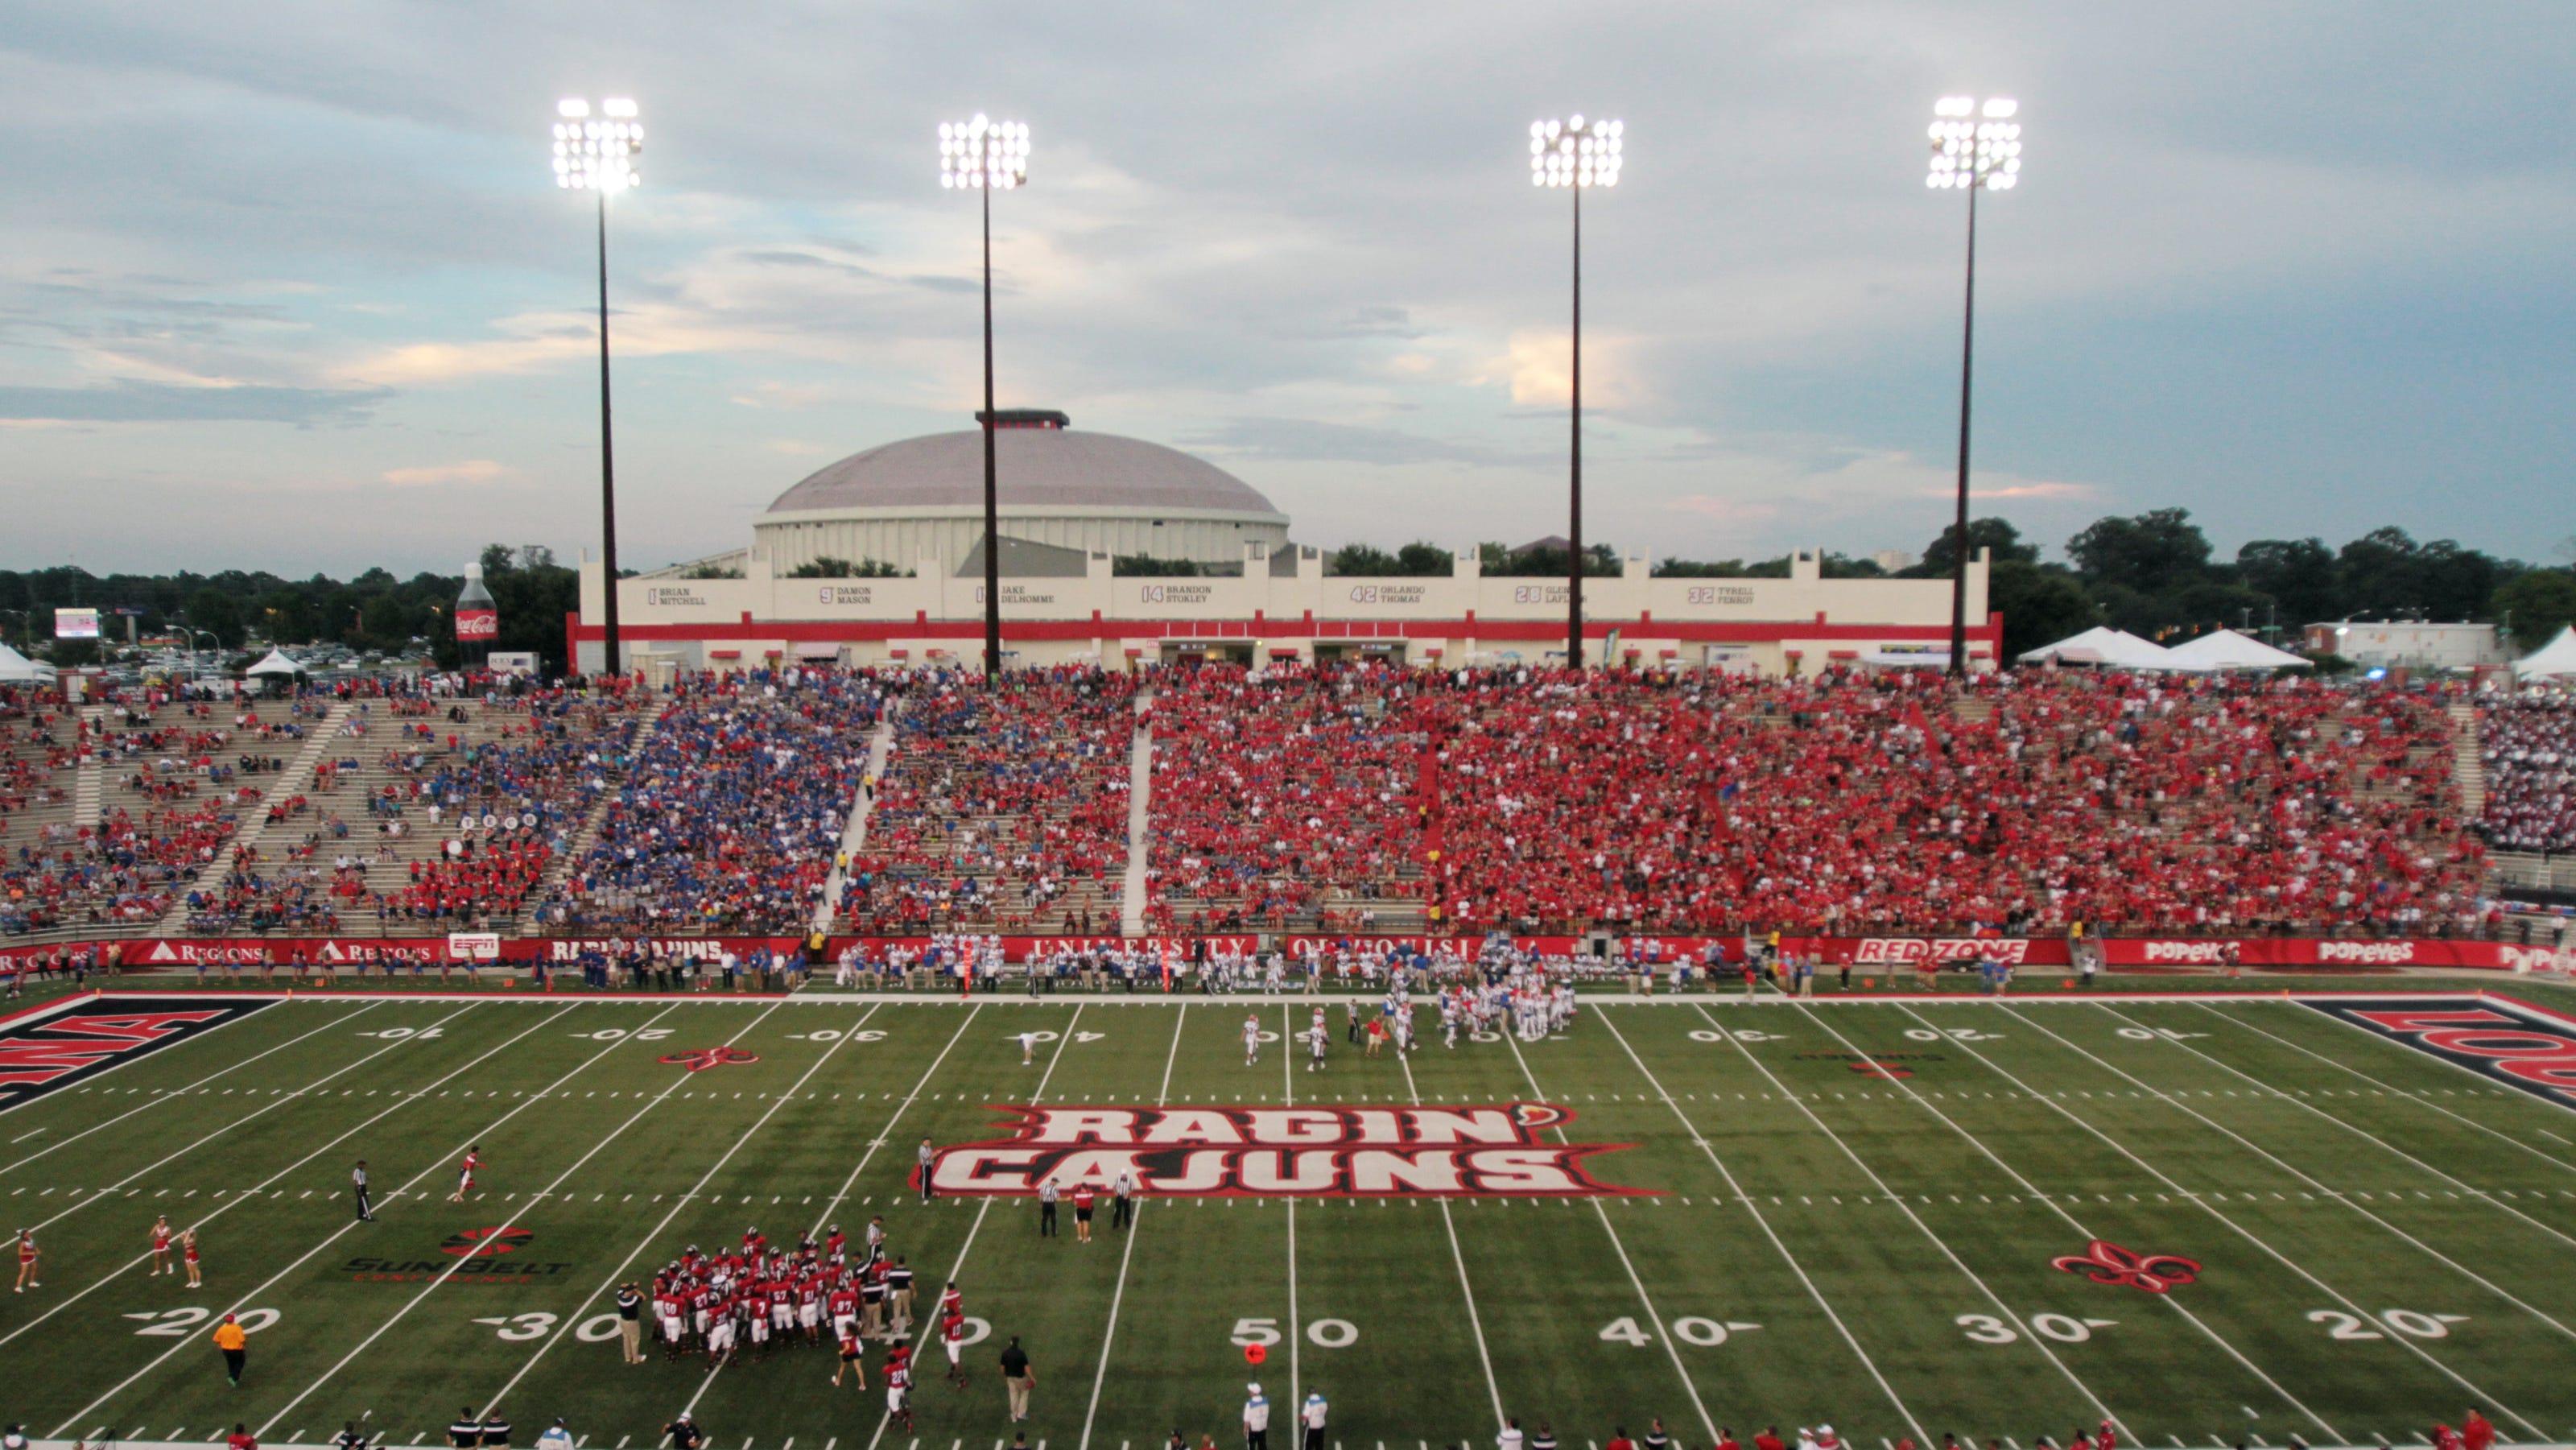 Louisiana Football Capacity Capped Alcohol Banned At Ul Games